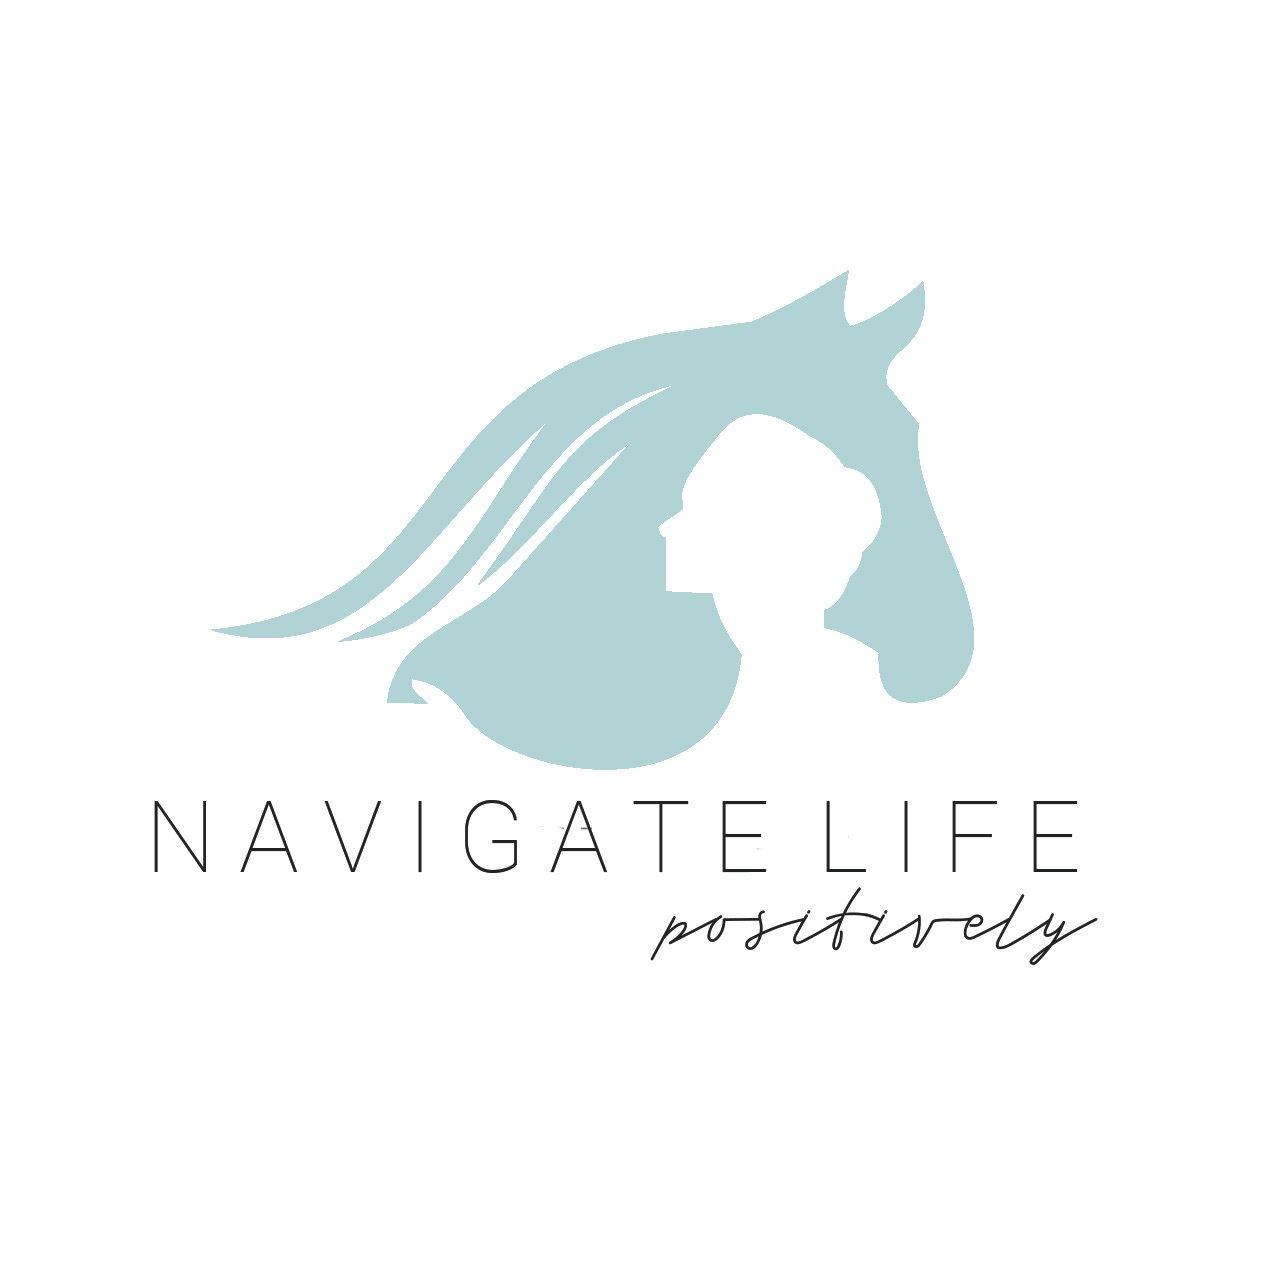 Navigate Life Positively